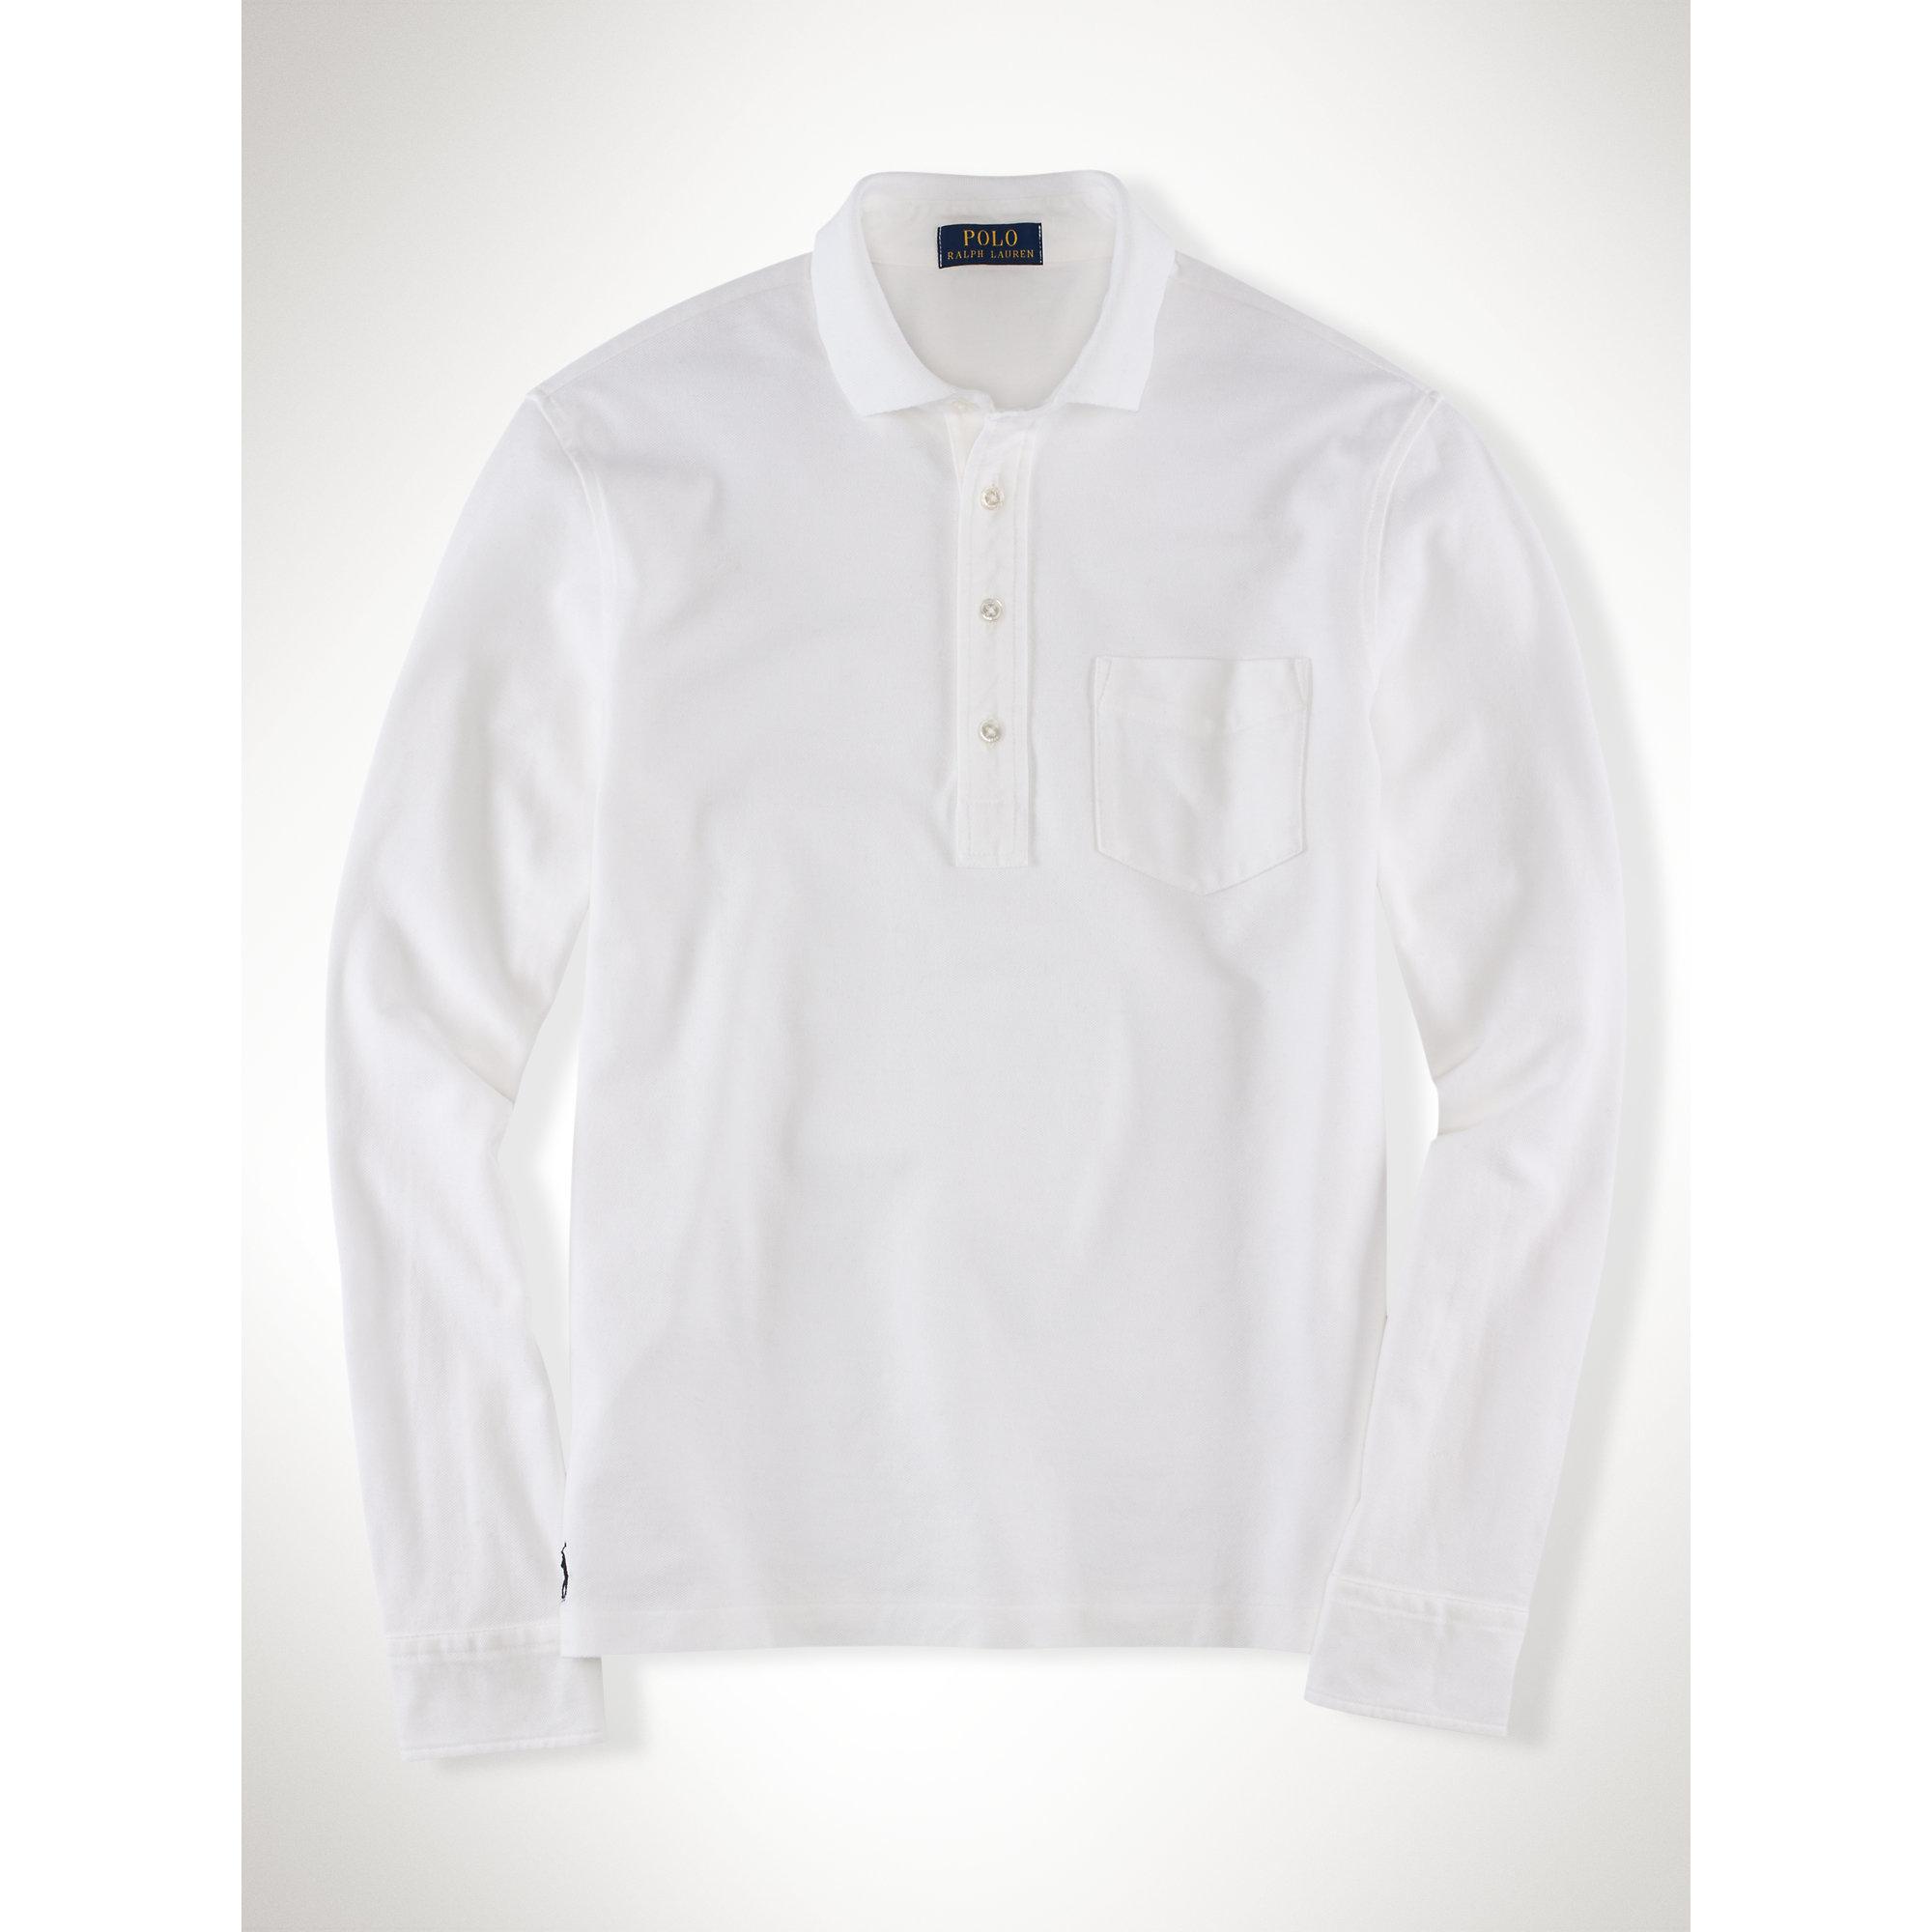 162413c5c1b9 ... official store lyst polo ralph lauren pima stretch mesh polo shirt in  white for men ae87e